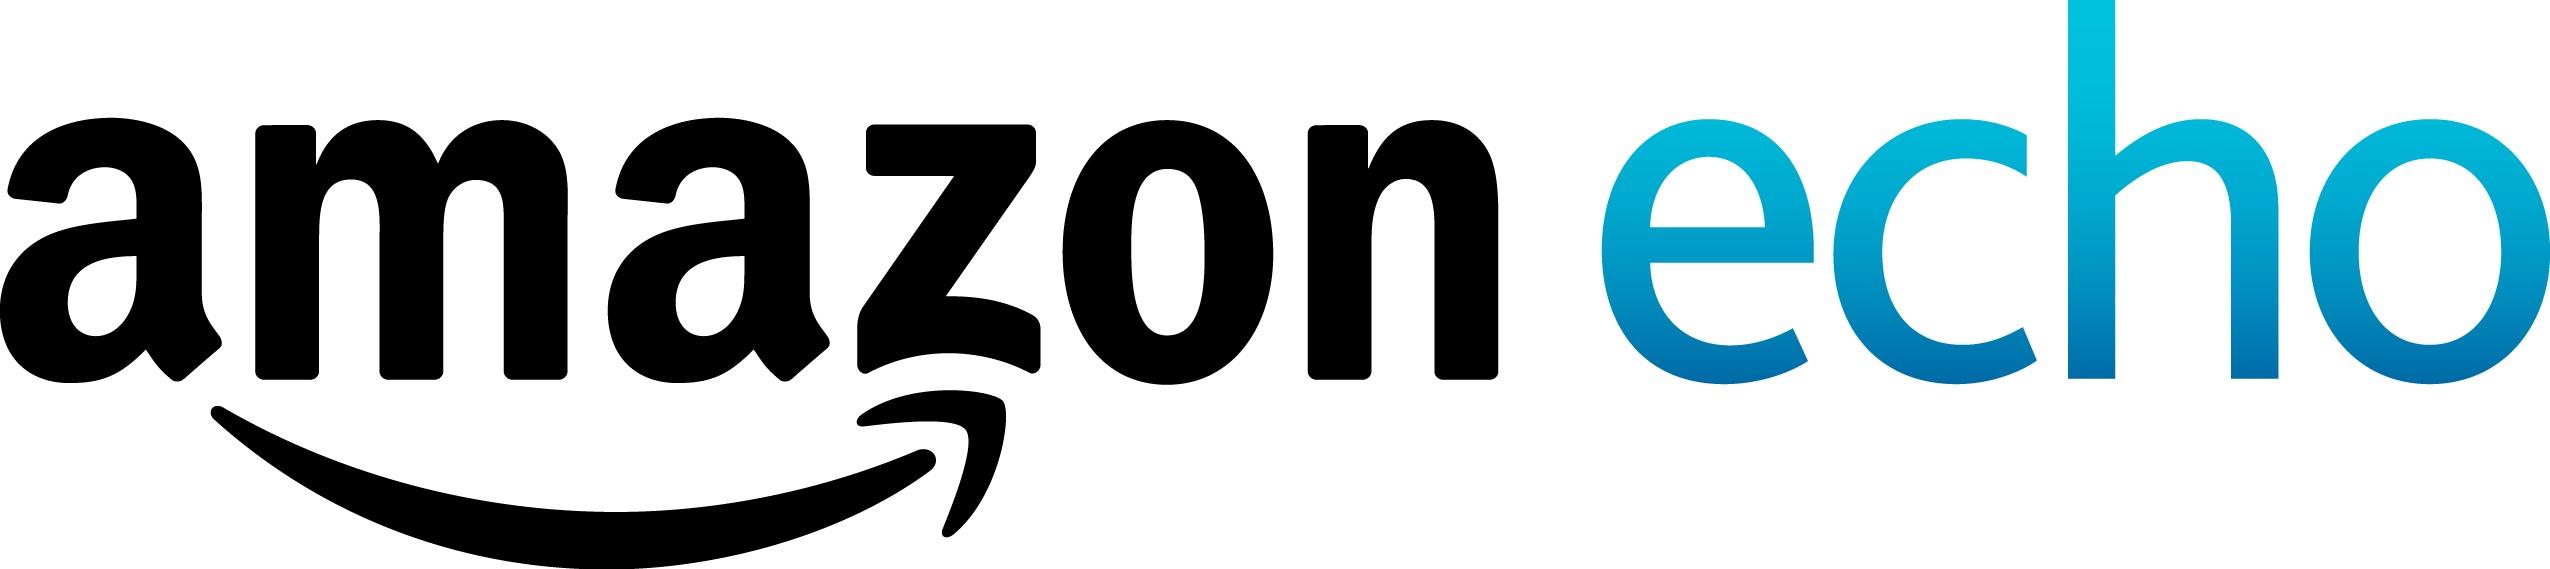 2550x569 Amazon Badges Vector Png Transparent Amazon Badges Vector.png